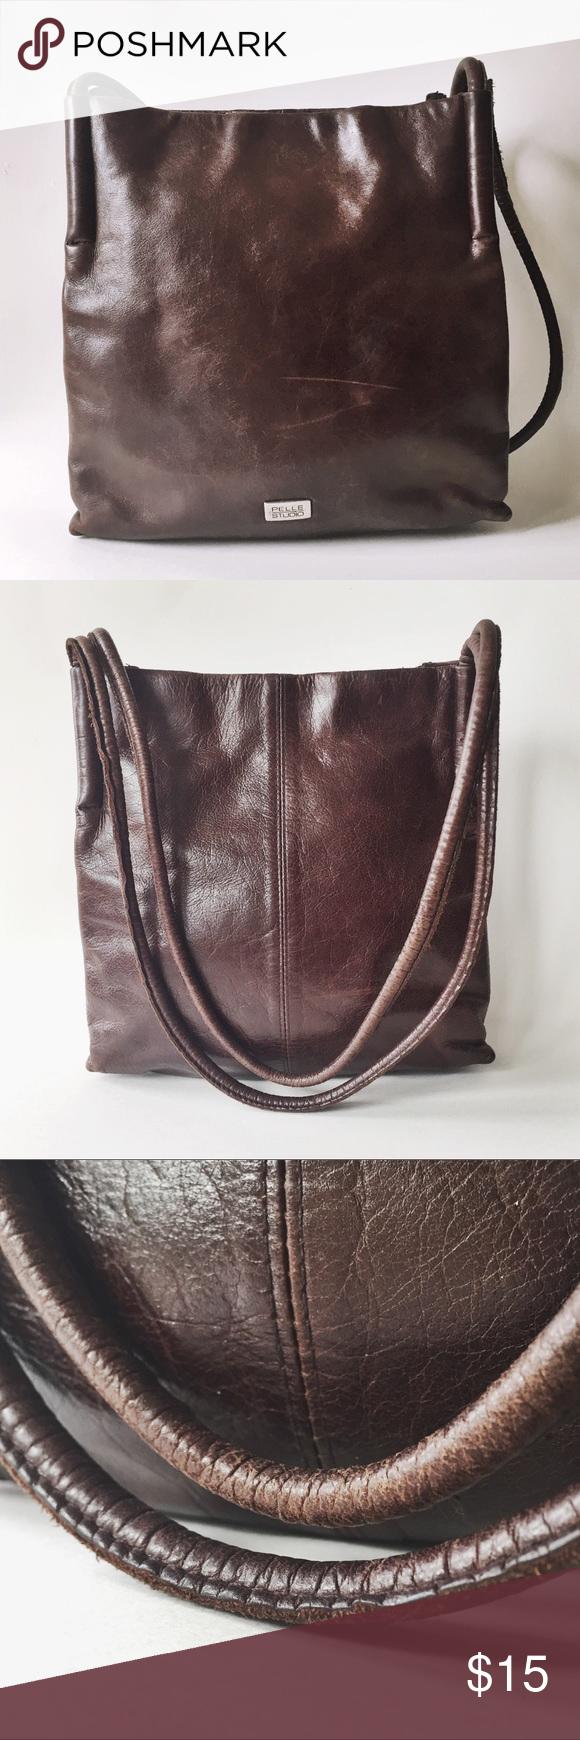 ️VINTAGE ️Wilson's Pelle Studio Small Purse Small purse